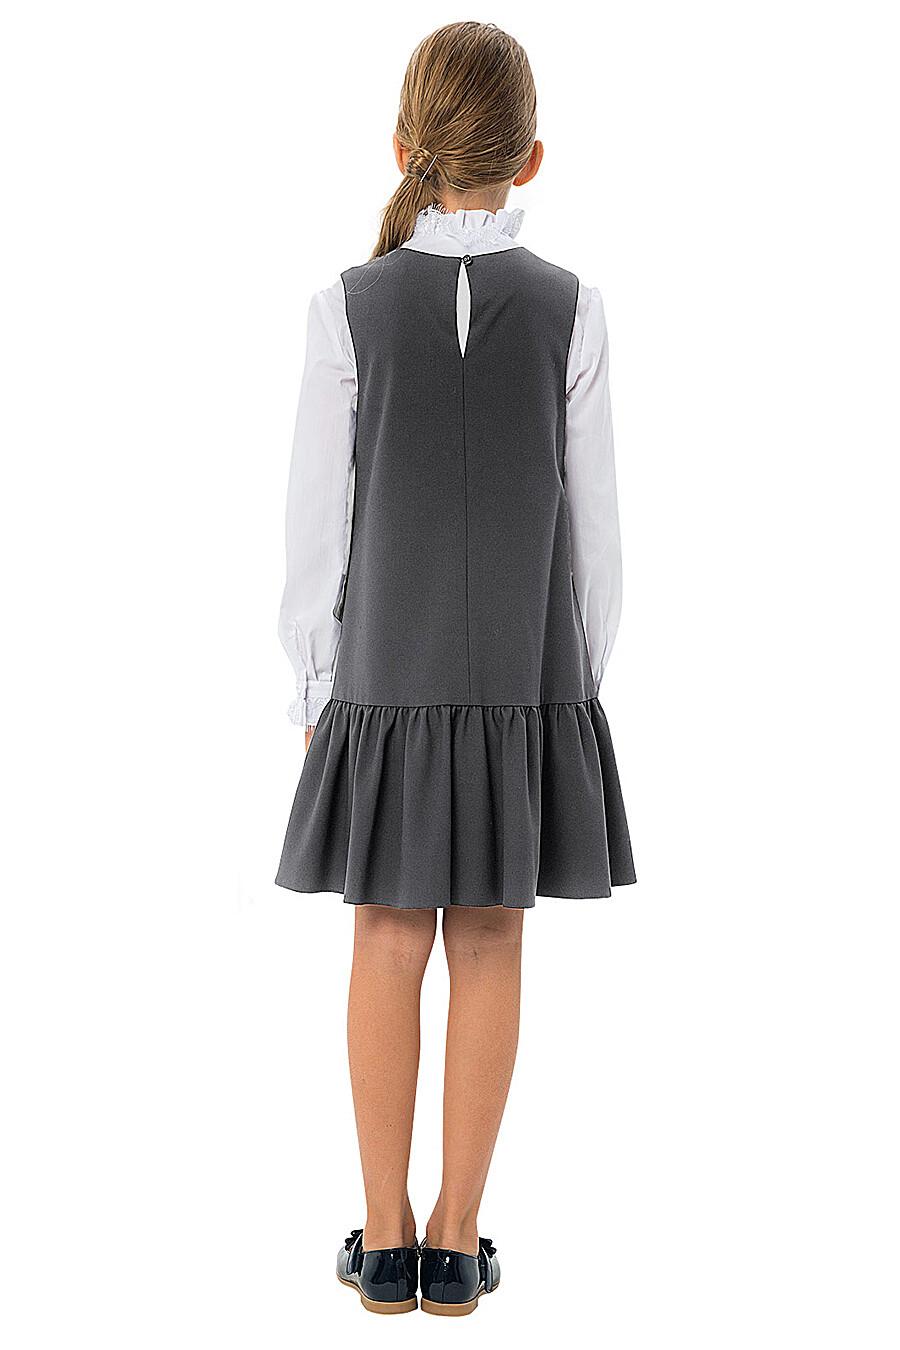 Сарафан КАРАМЕЛЛИ (683281), купить в Moyo.moda